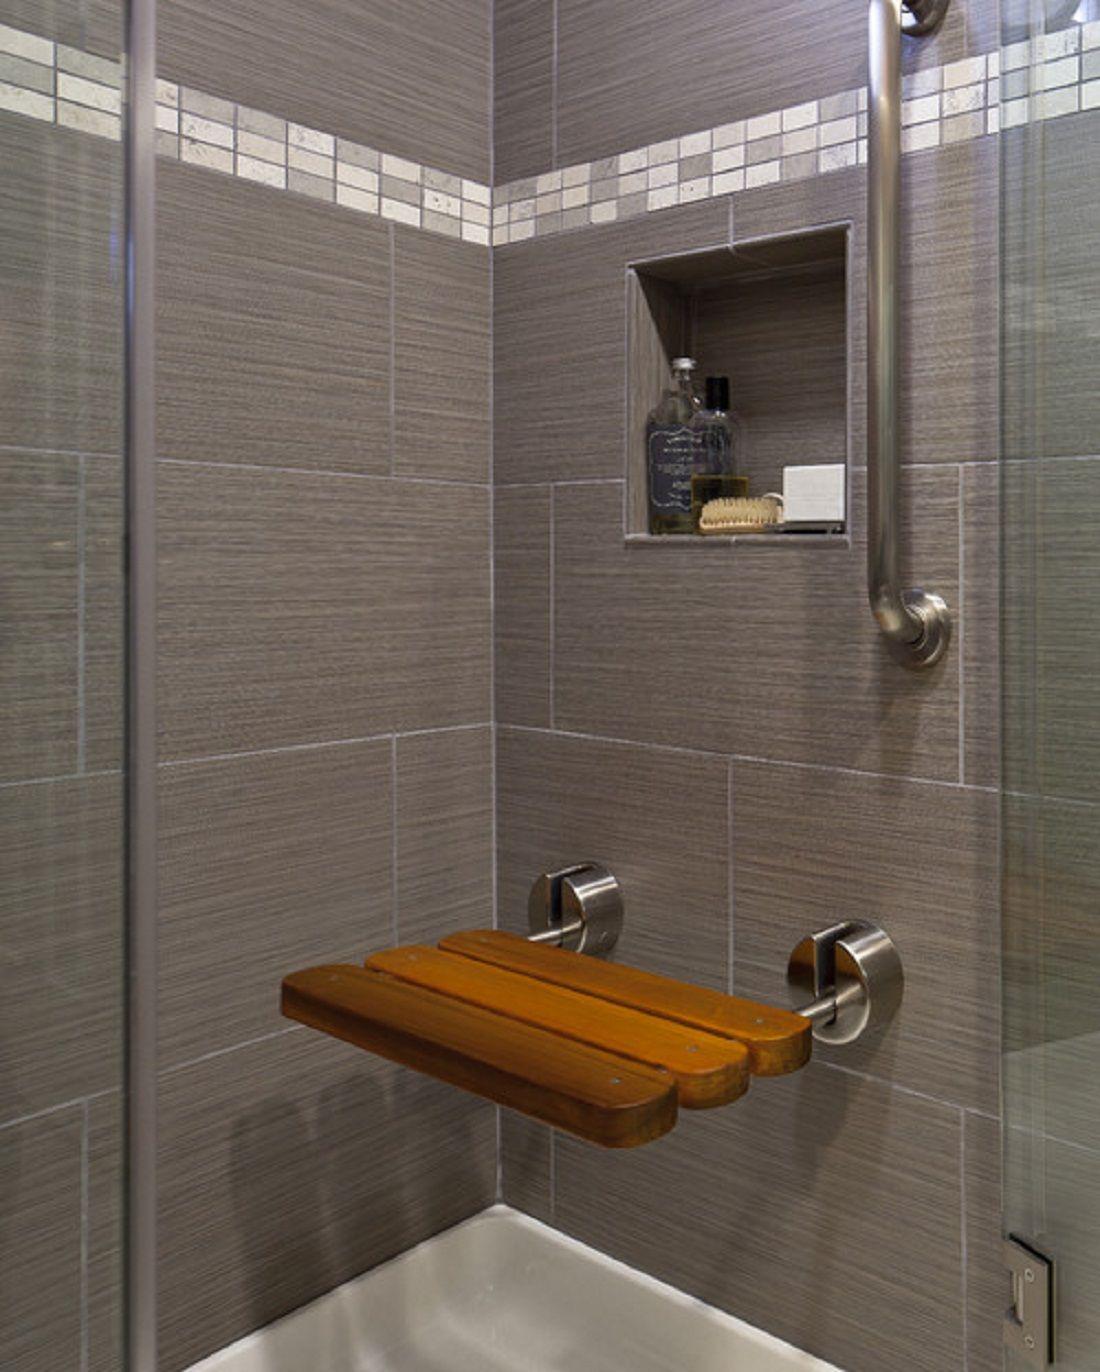 Elegant Gray Bathroom Wall Tile Plus Square Niche for Soap